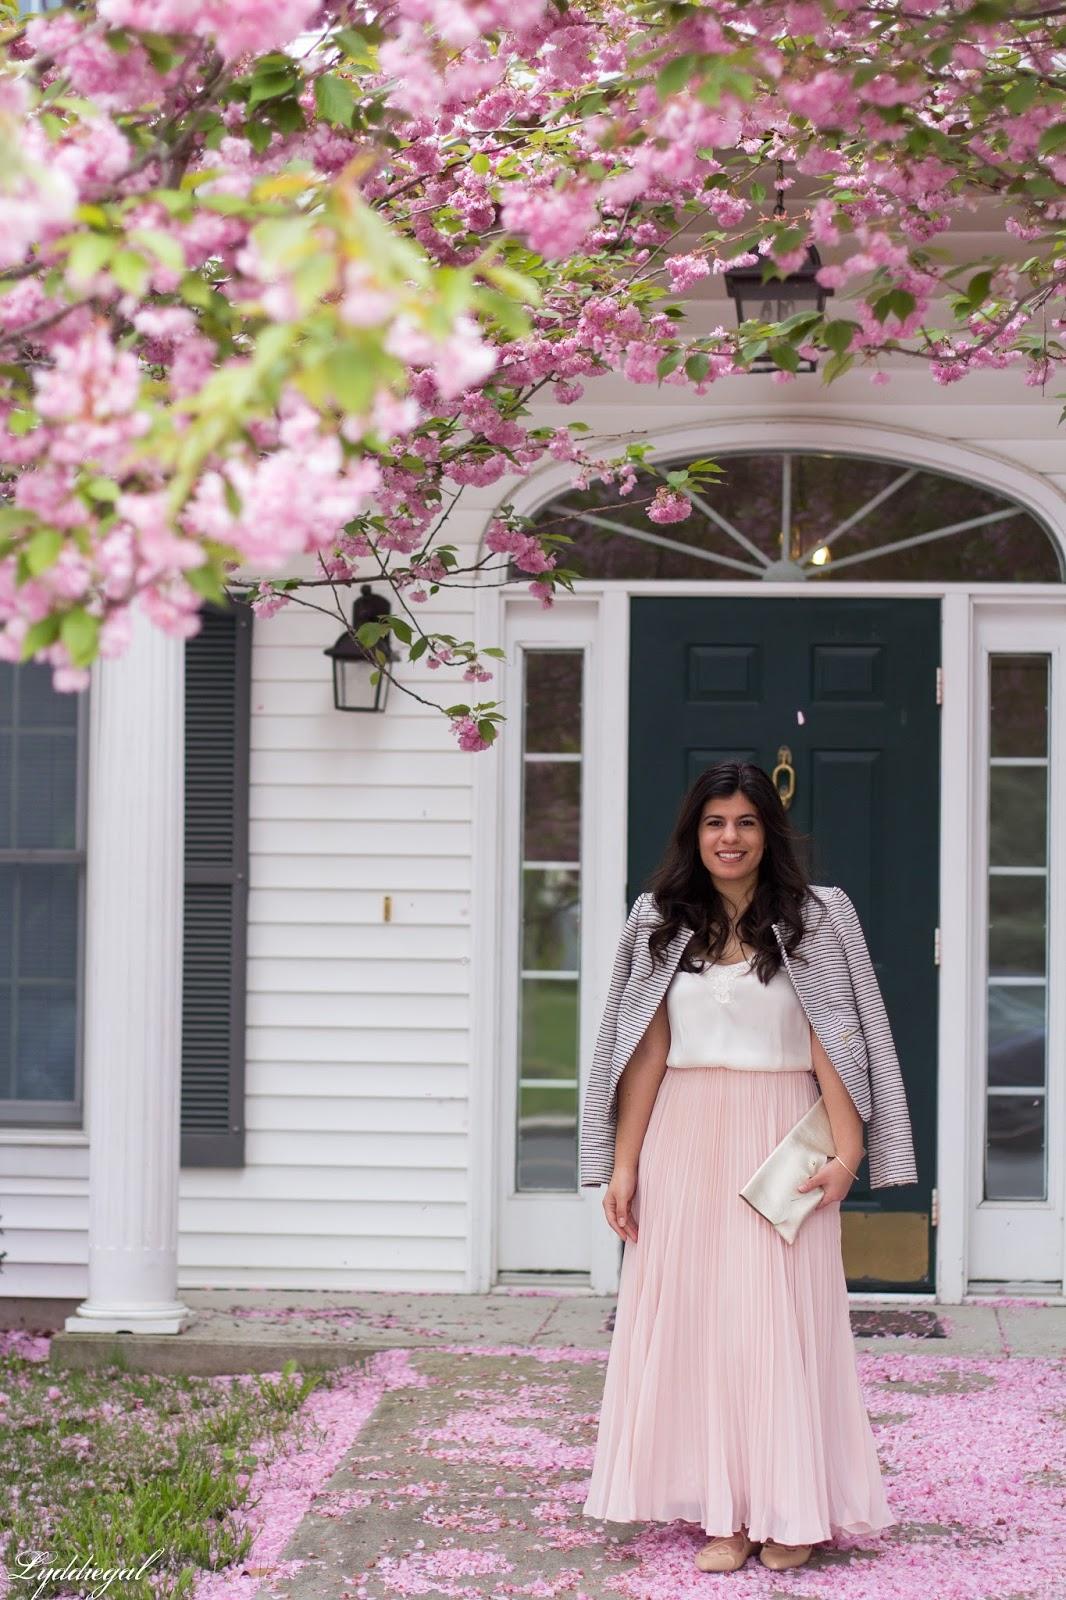 blush pleated maxi skirt, lace cami, striped blazer, scalloped clutch